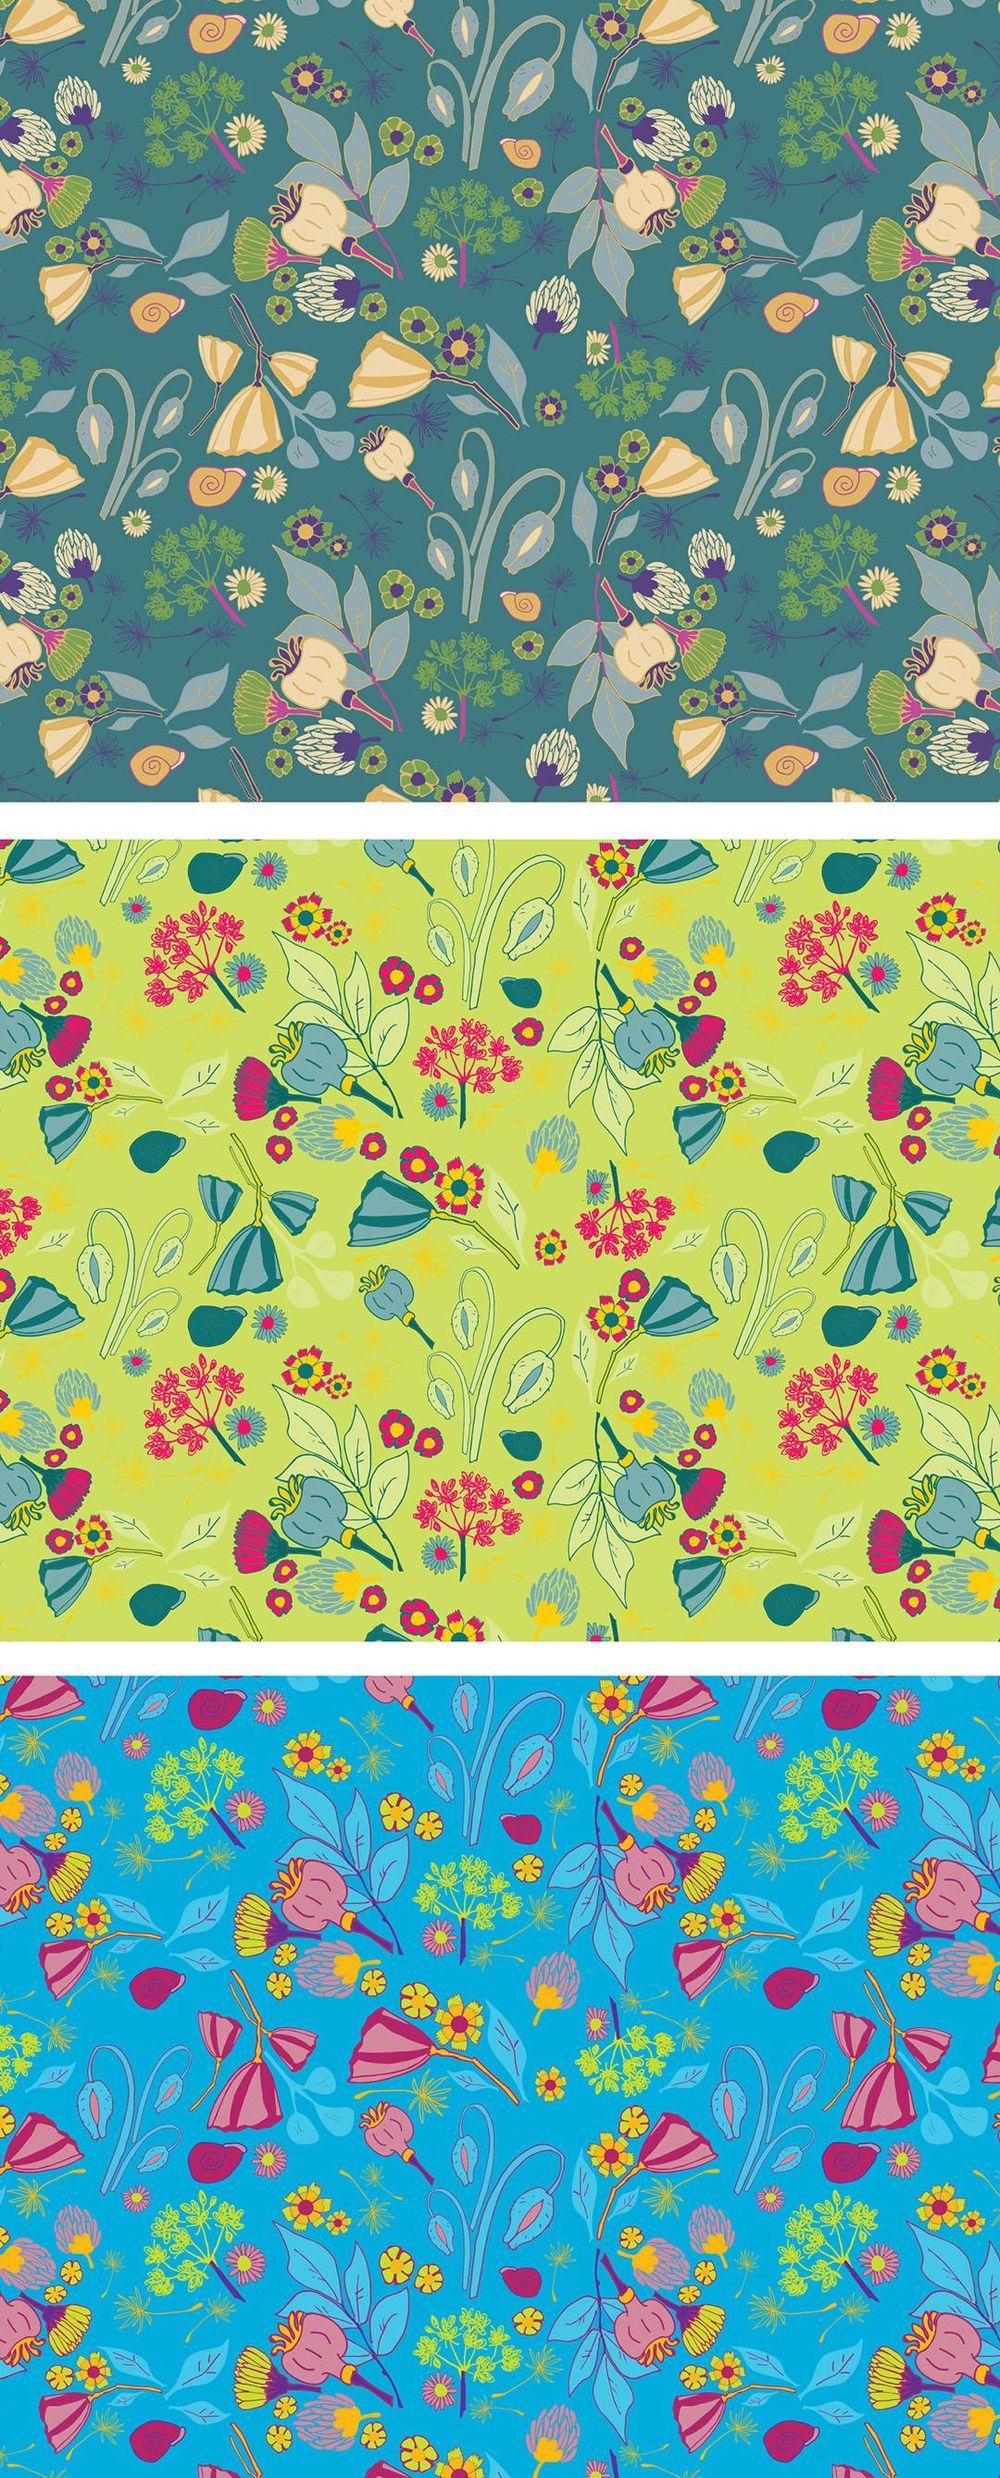 Illustrator: Surface pattern design - image 4 - student project